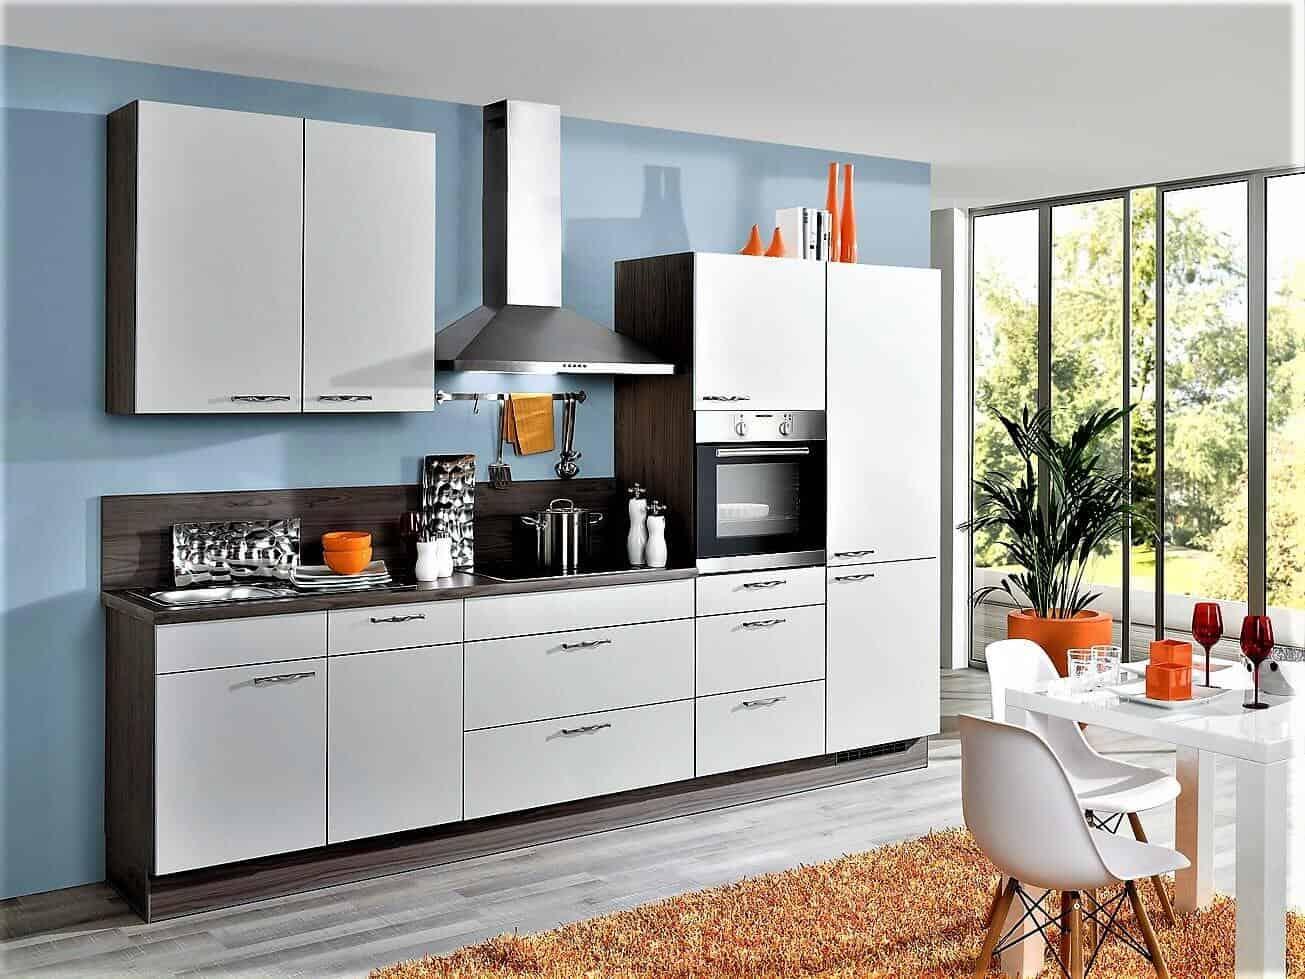 gnstige kchen berlin awesome kchen berlin gnstig kchen design berlin nolte kchen fronten. Black Bedroom Furniture Sets. Home Design Ideas